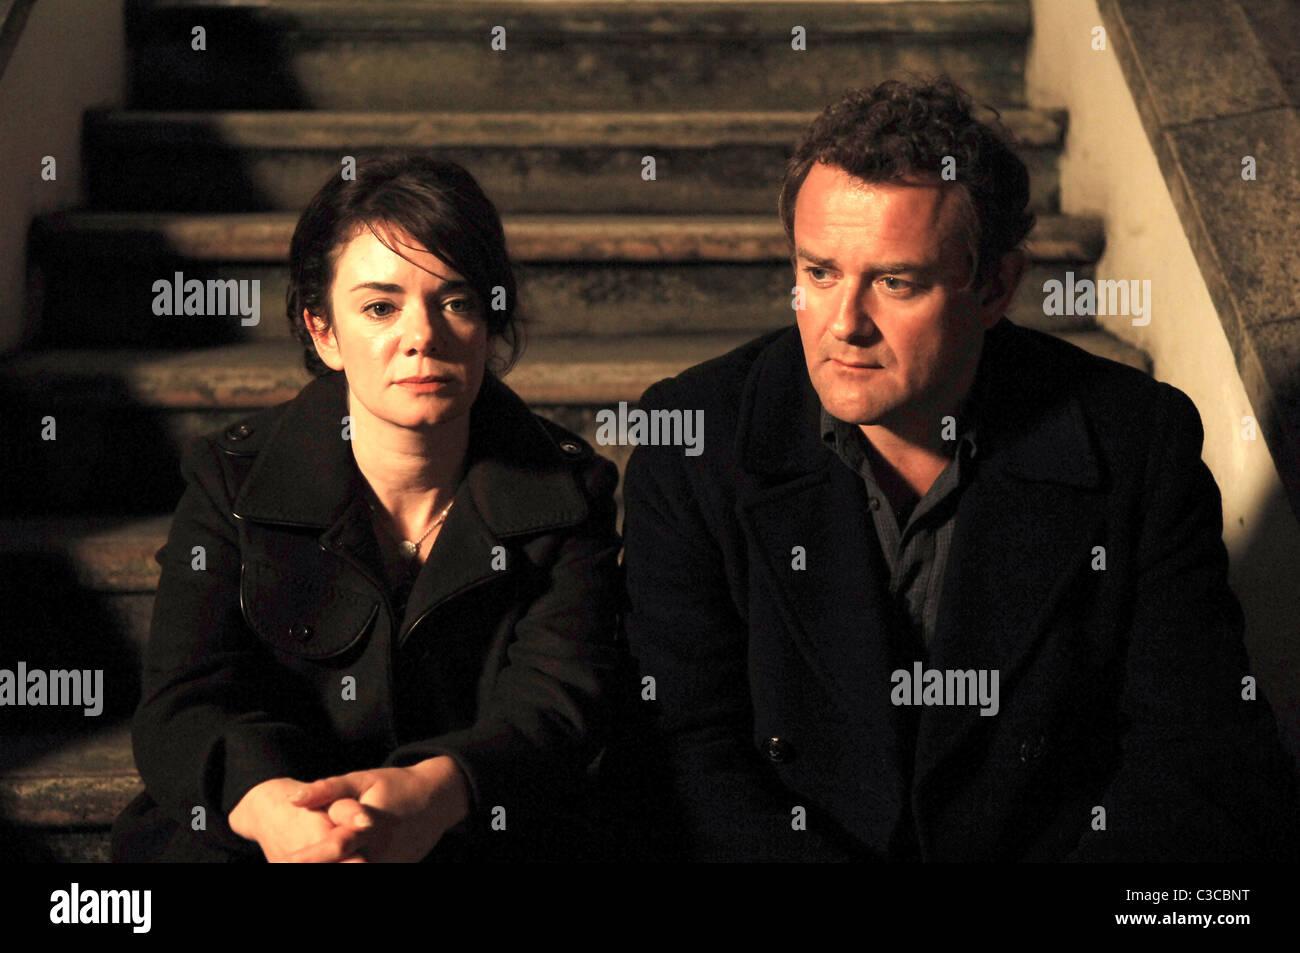 VICTORIA HAMILTON & HUGH BONNEVILLE FRENCH FILM (2008) - Stock Image